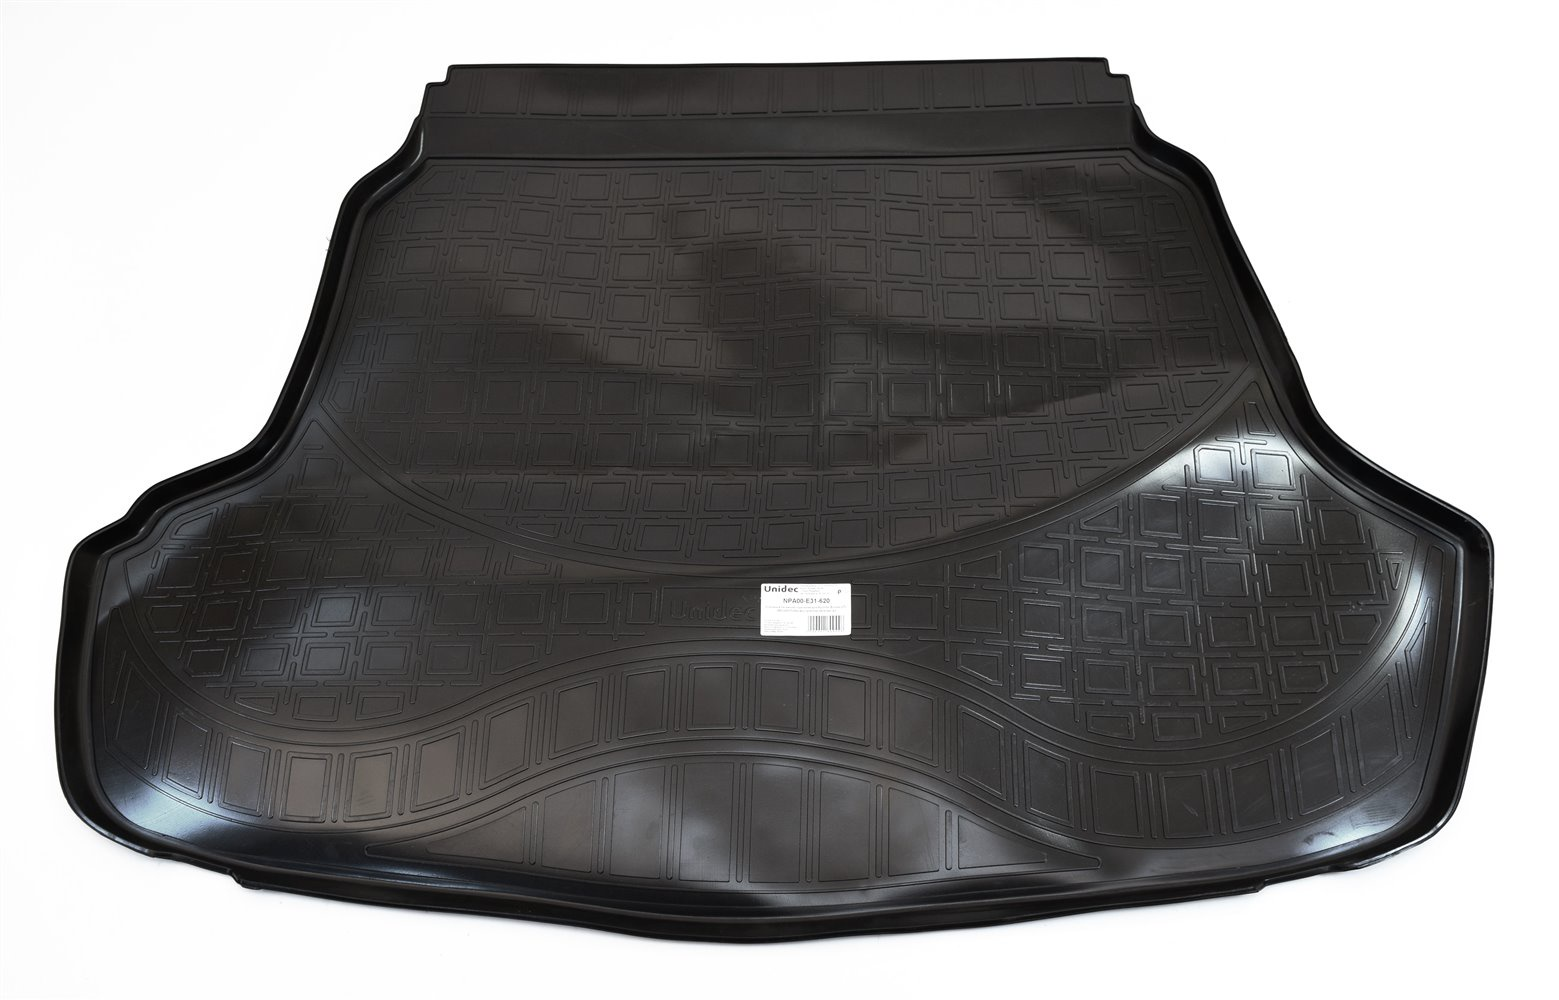 Коврик багажника для vaz 2190 granta hb (2014-) (полимер) npa00-e94-400 коврик багажника для vaz niva 2121